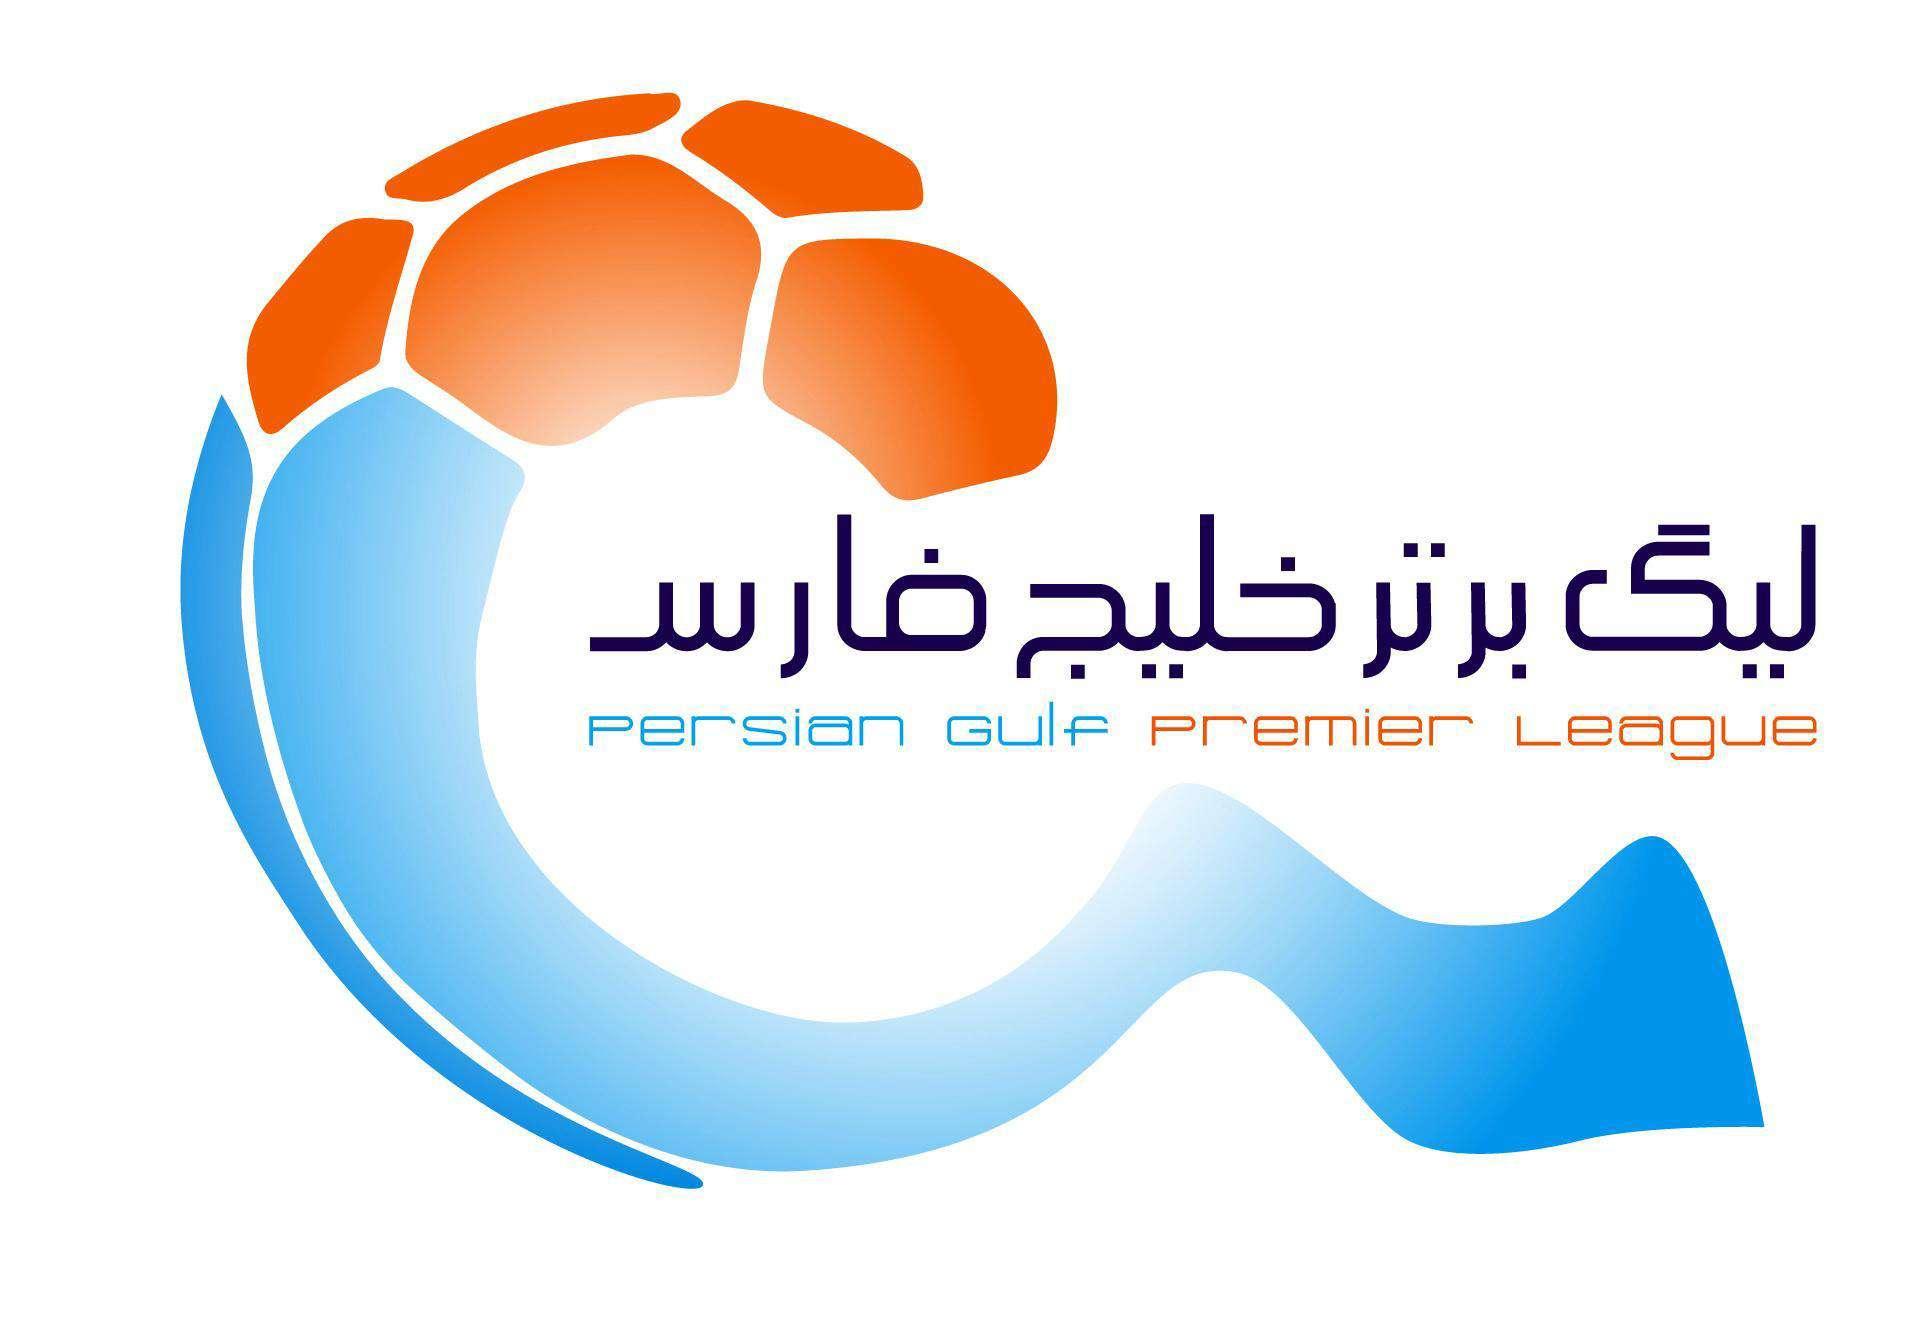 برنامه هفته هشتم لیگ برتر فوتبال اعلام شد